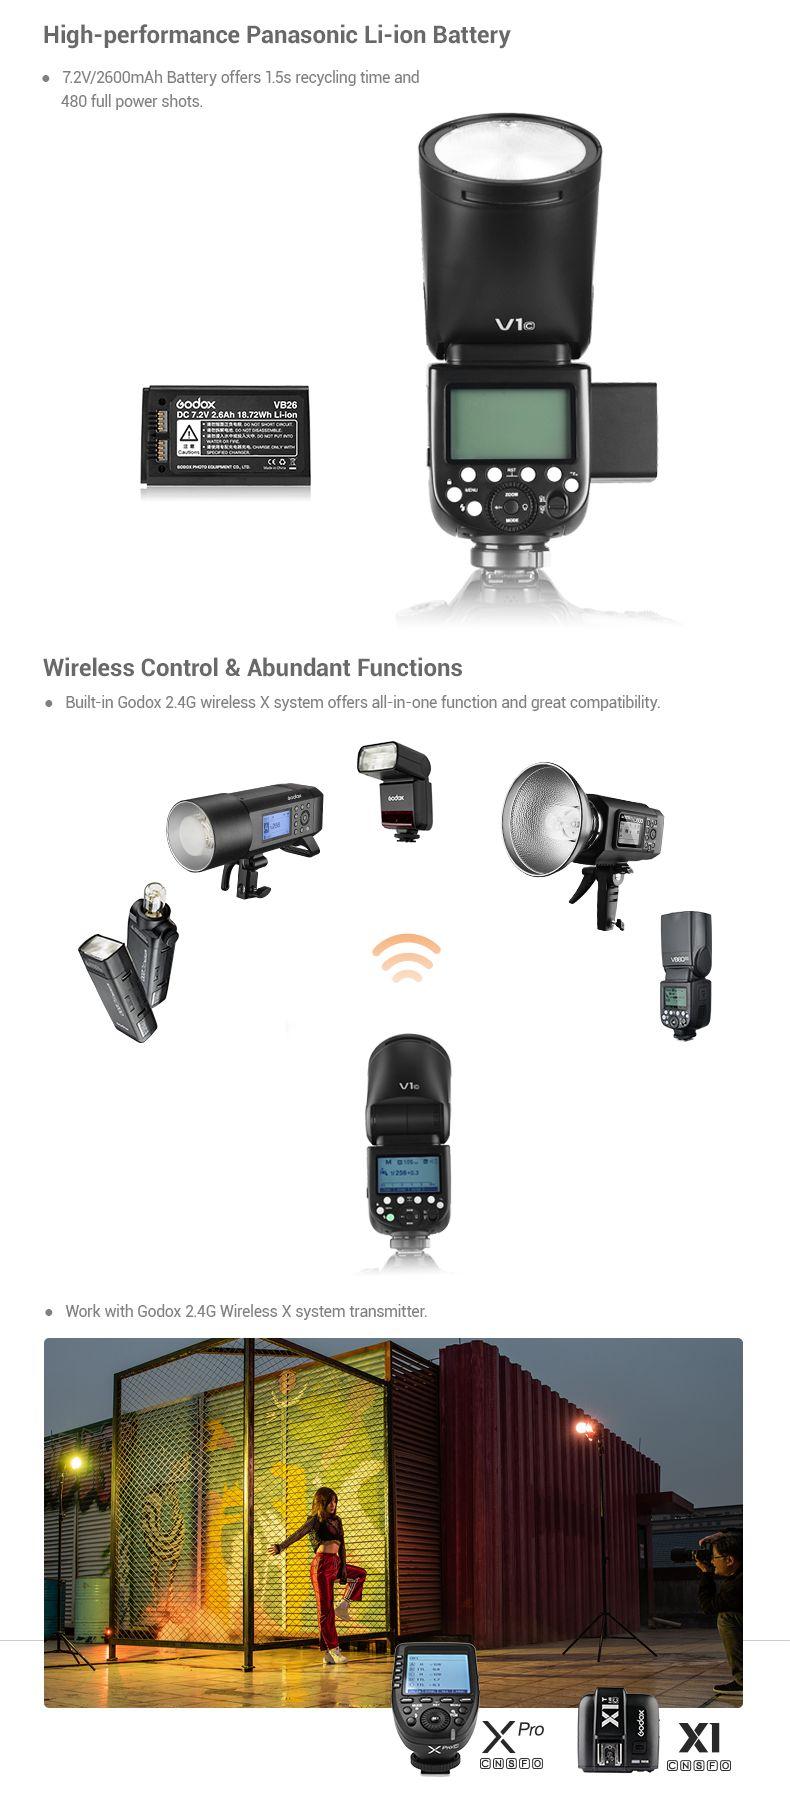 Godox V1 High-performance Panasonic Li-ion Battery. Wireless Control and Abundant Functions